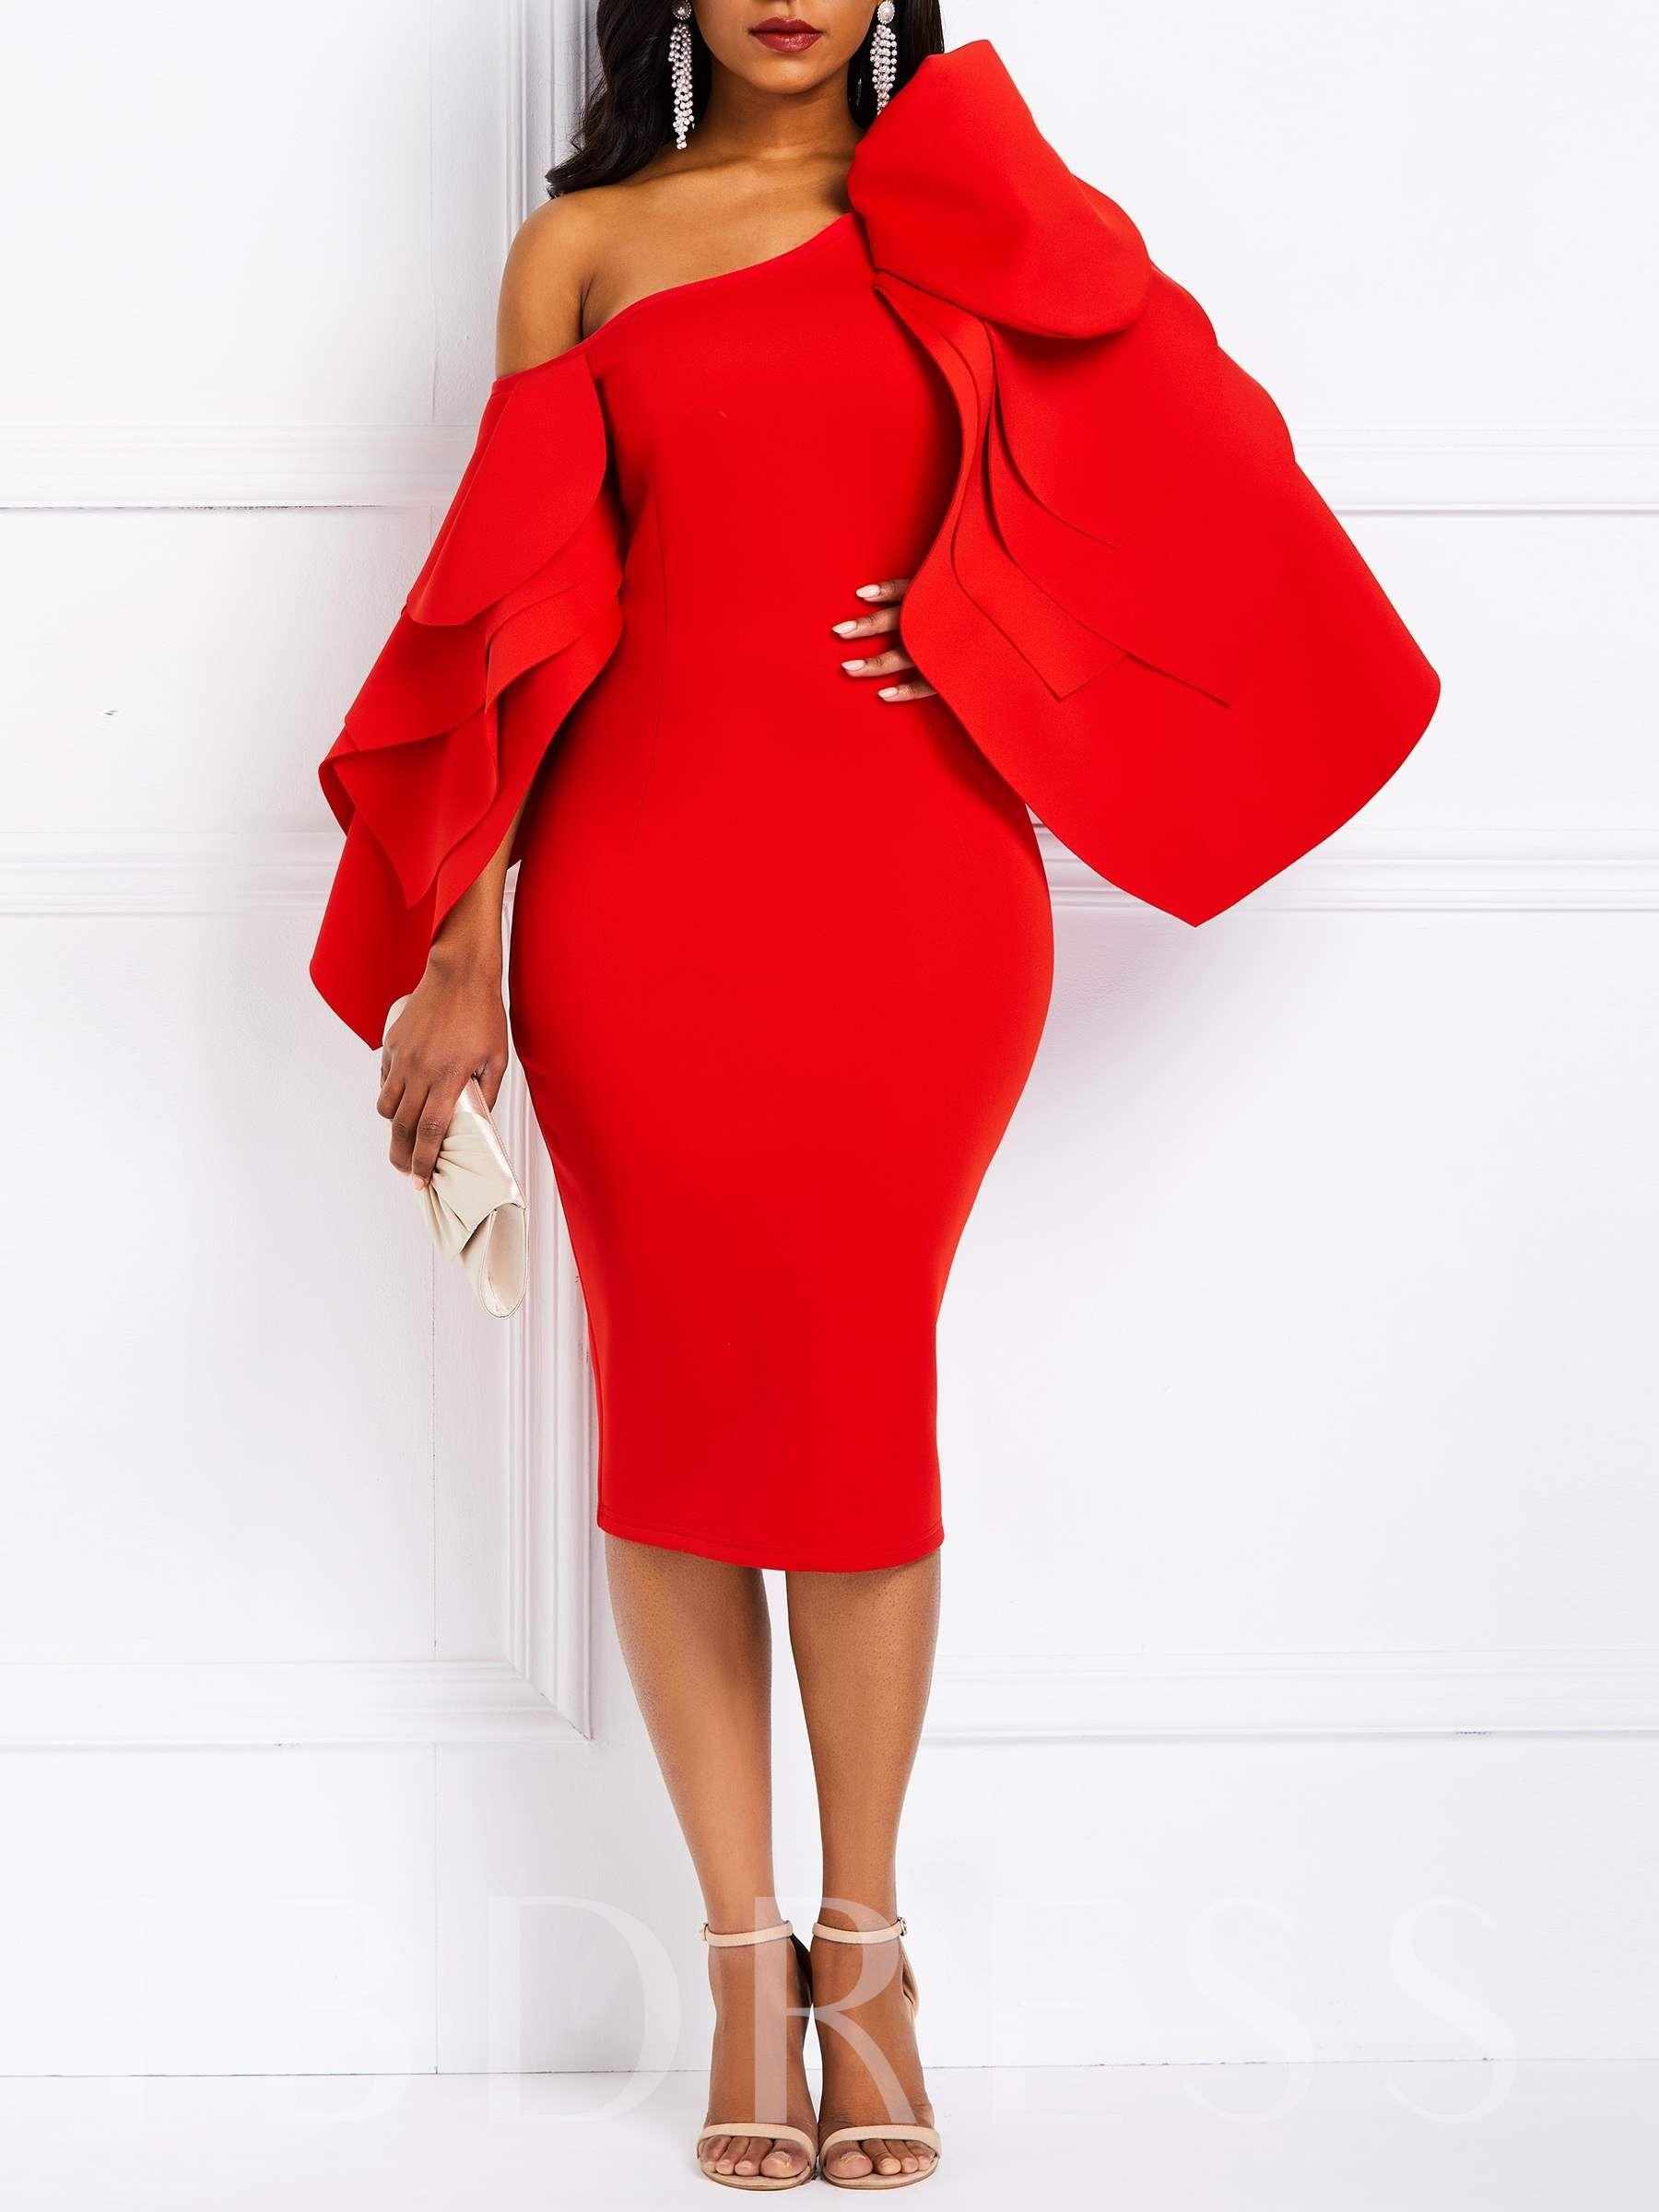 Falbala Oblique Collar Long Sleeve Elegant Women S Party Dress Red Bodycon Dress Womens Sheath Dress Bodycon Dress With Sleeves [ 2400 x 1800 Pixel ]